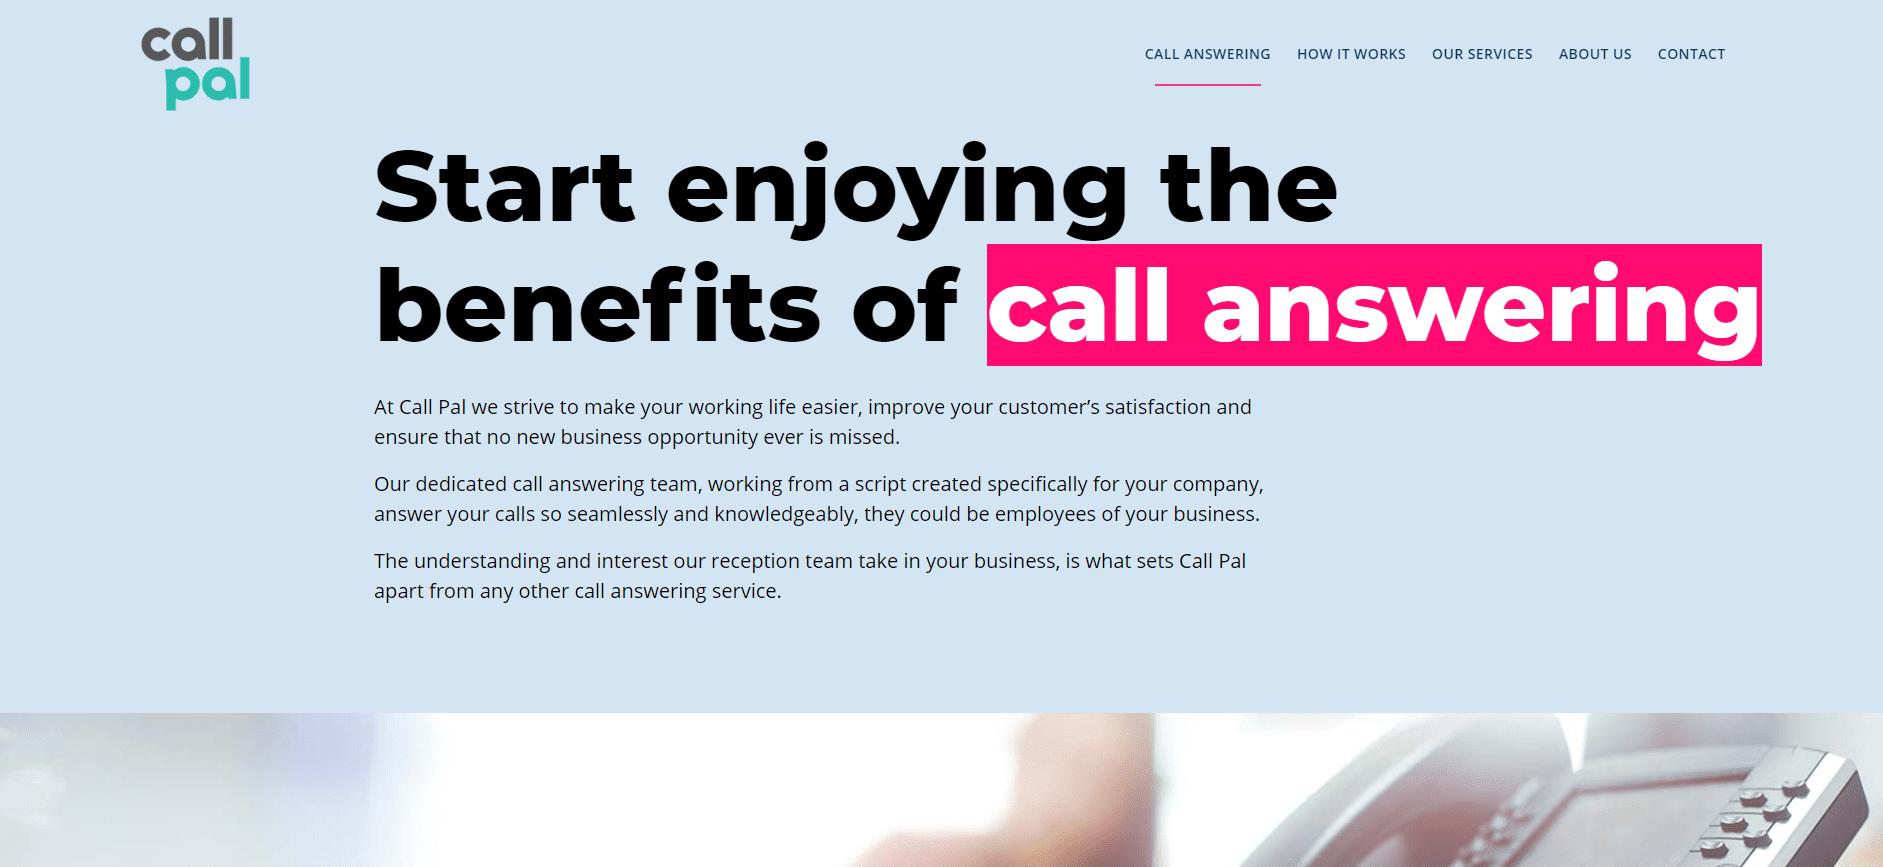 call pal website